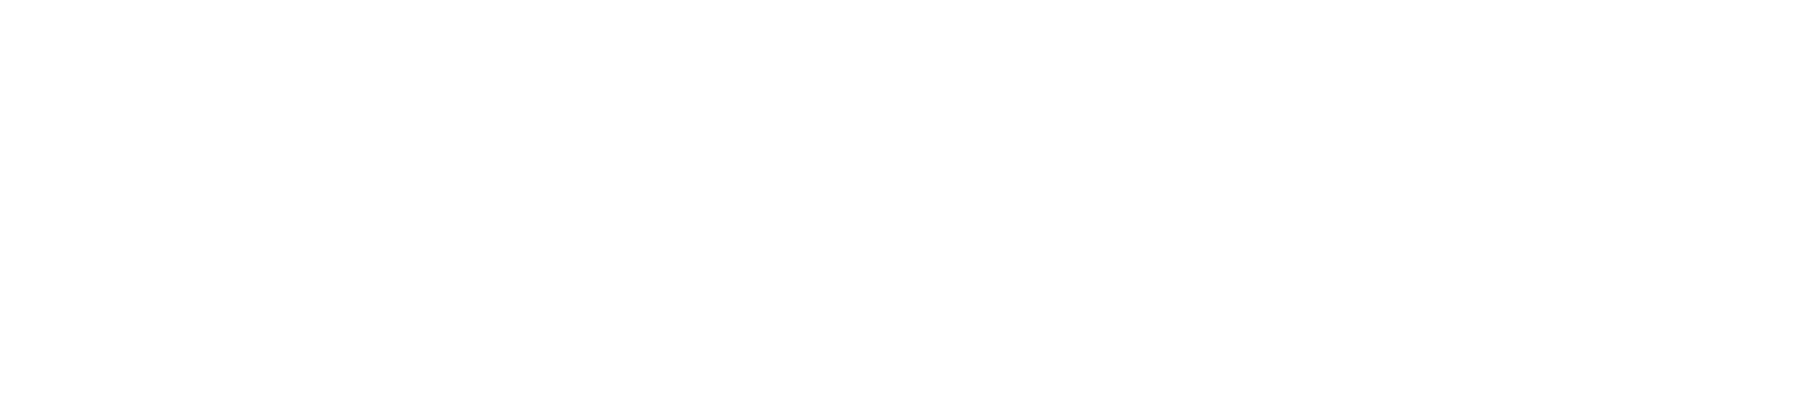 gallery_final